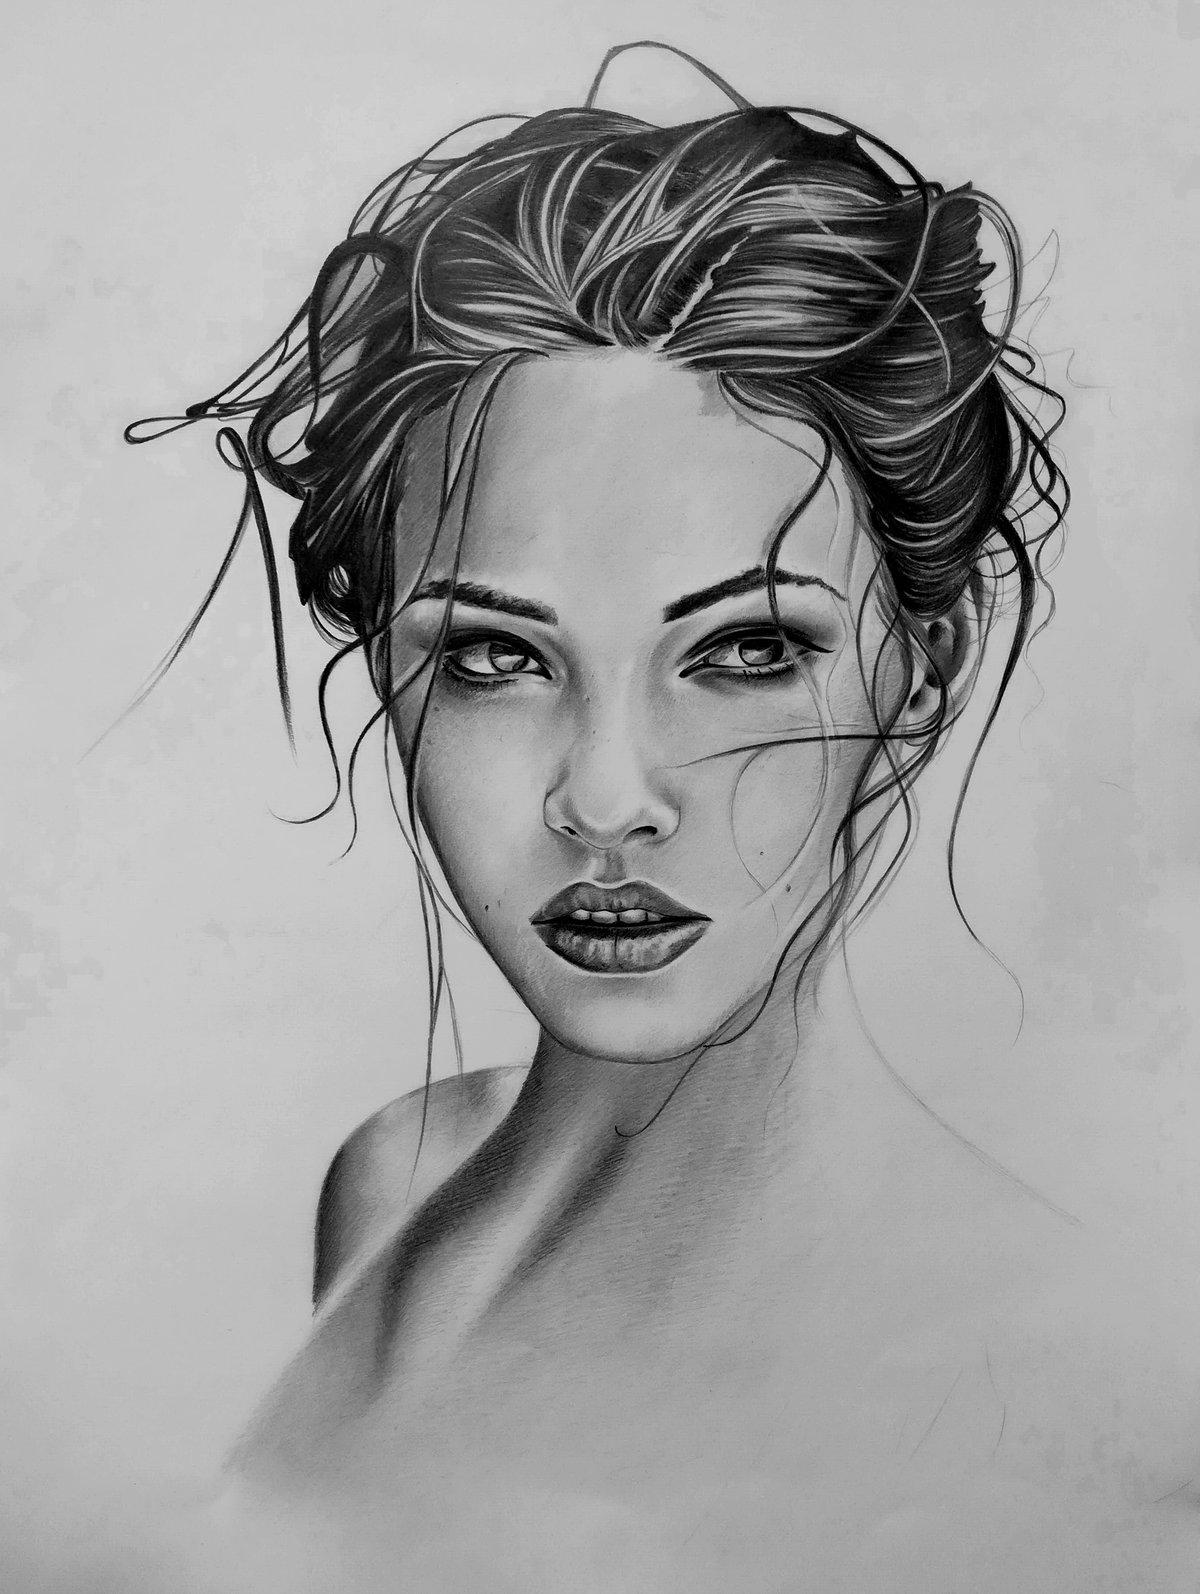 Сладких, рисунок карандашом девушки